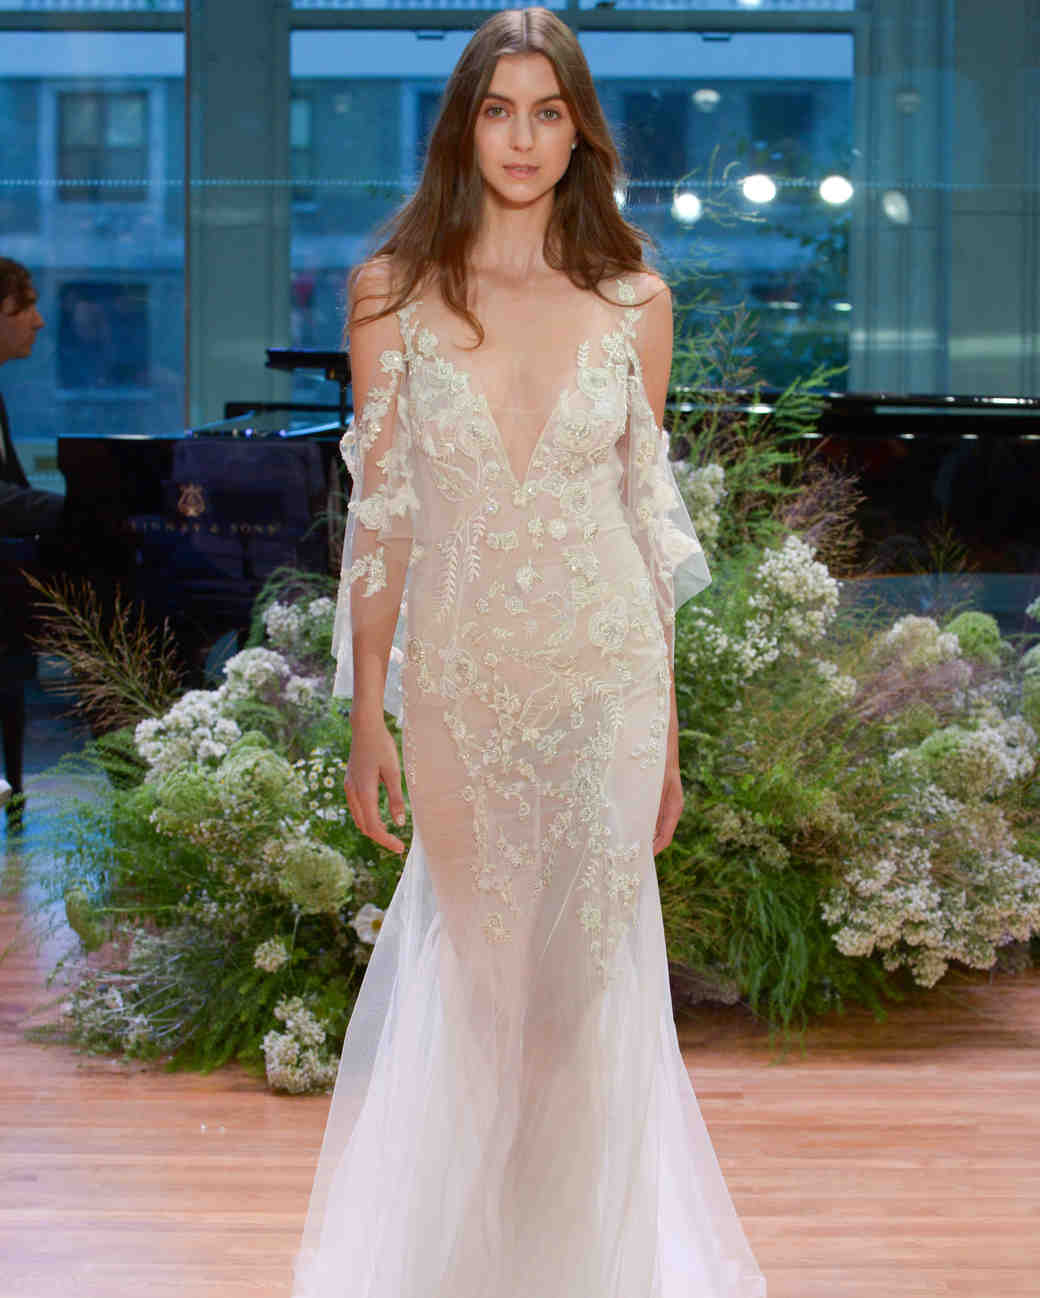 Wedding Dresses 2017: Monique Lhuillier Fall 2017 Wedding Dress Collection